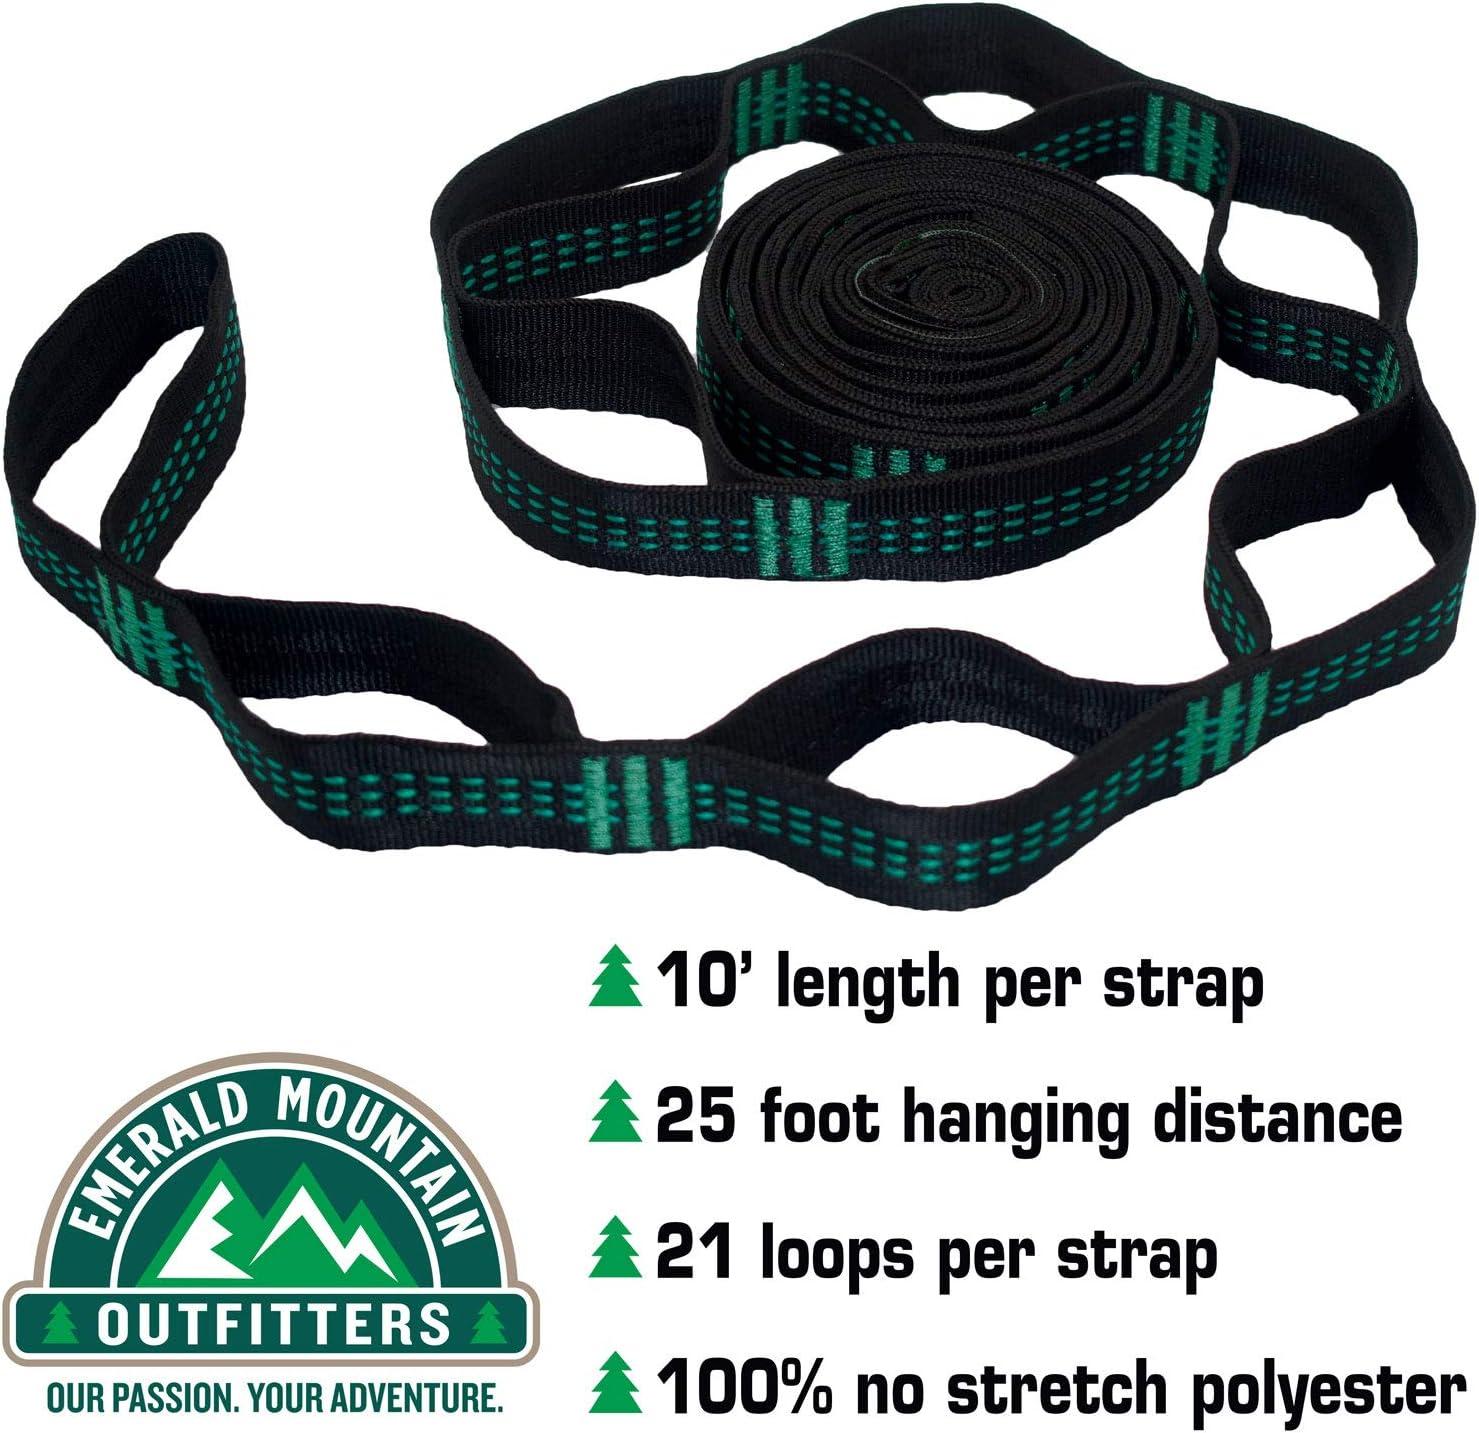 Polyester Slap Straps Suspension Hanging System for ENO Hammock 800 Pounds